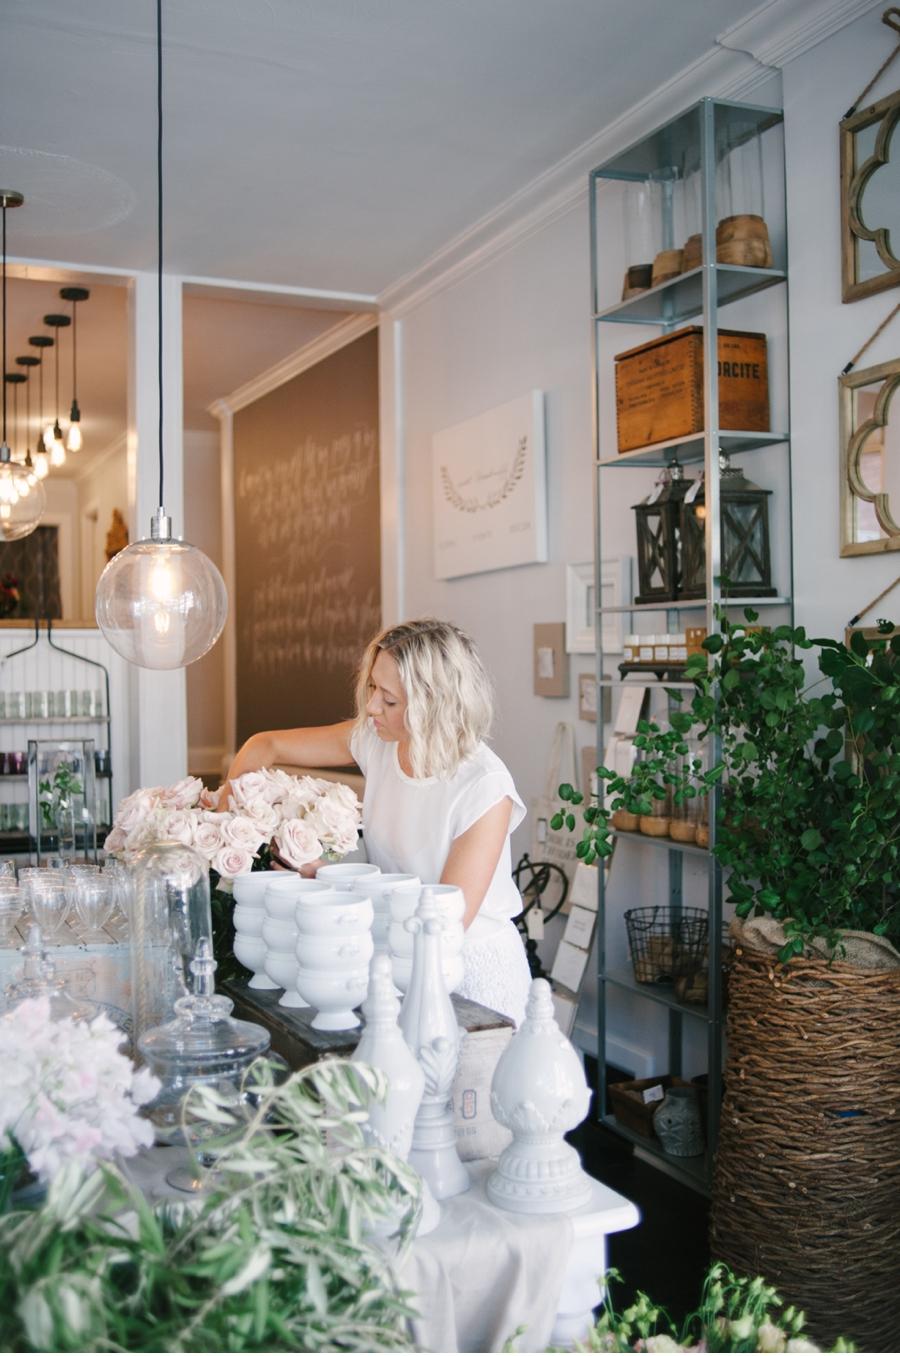 Vale-and-Vine-Canadian-Wedding-Blog